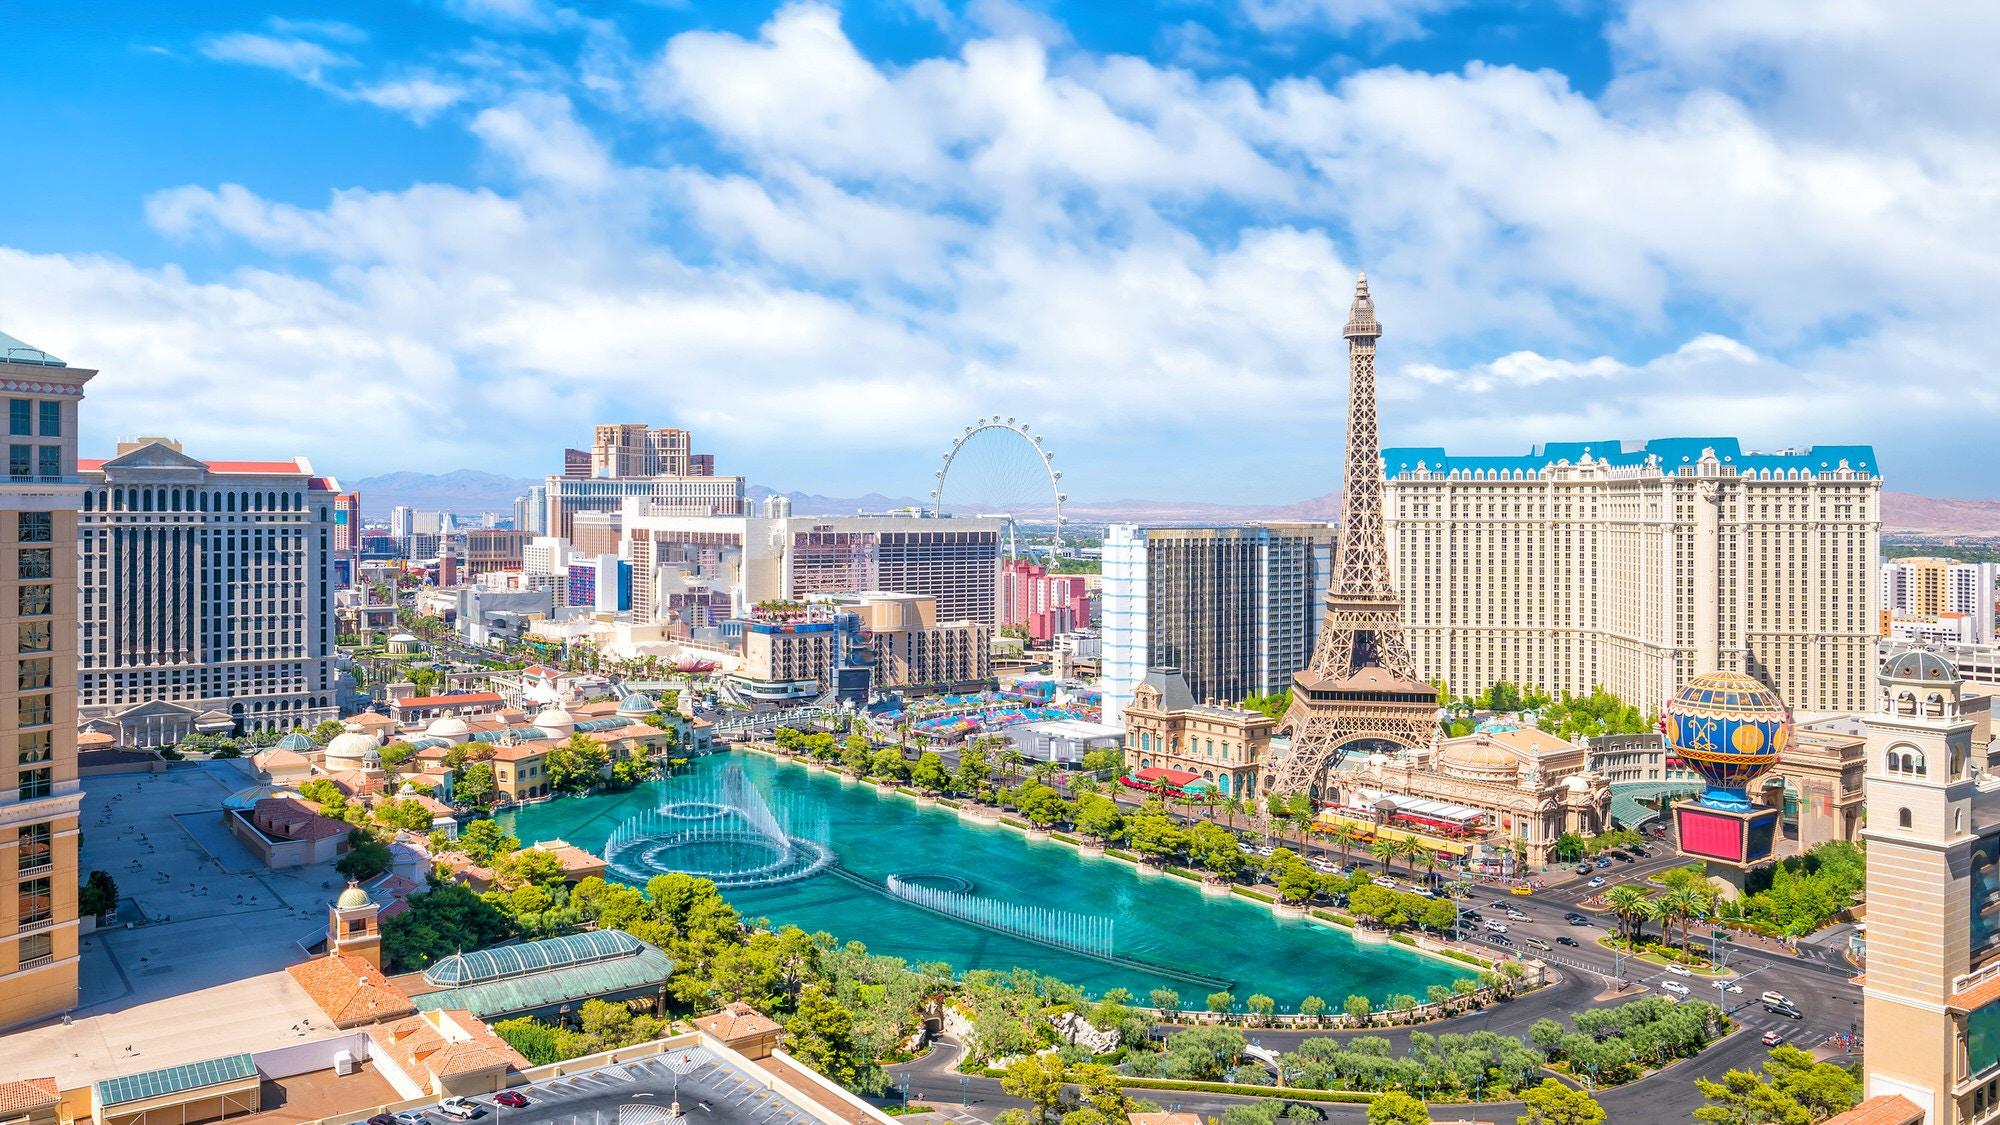 High-angle view of the Las Vegas Strip